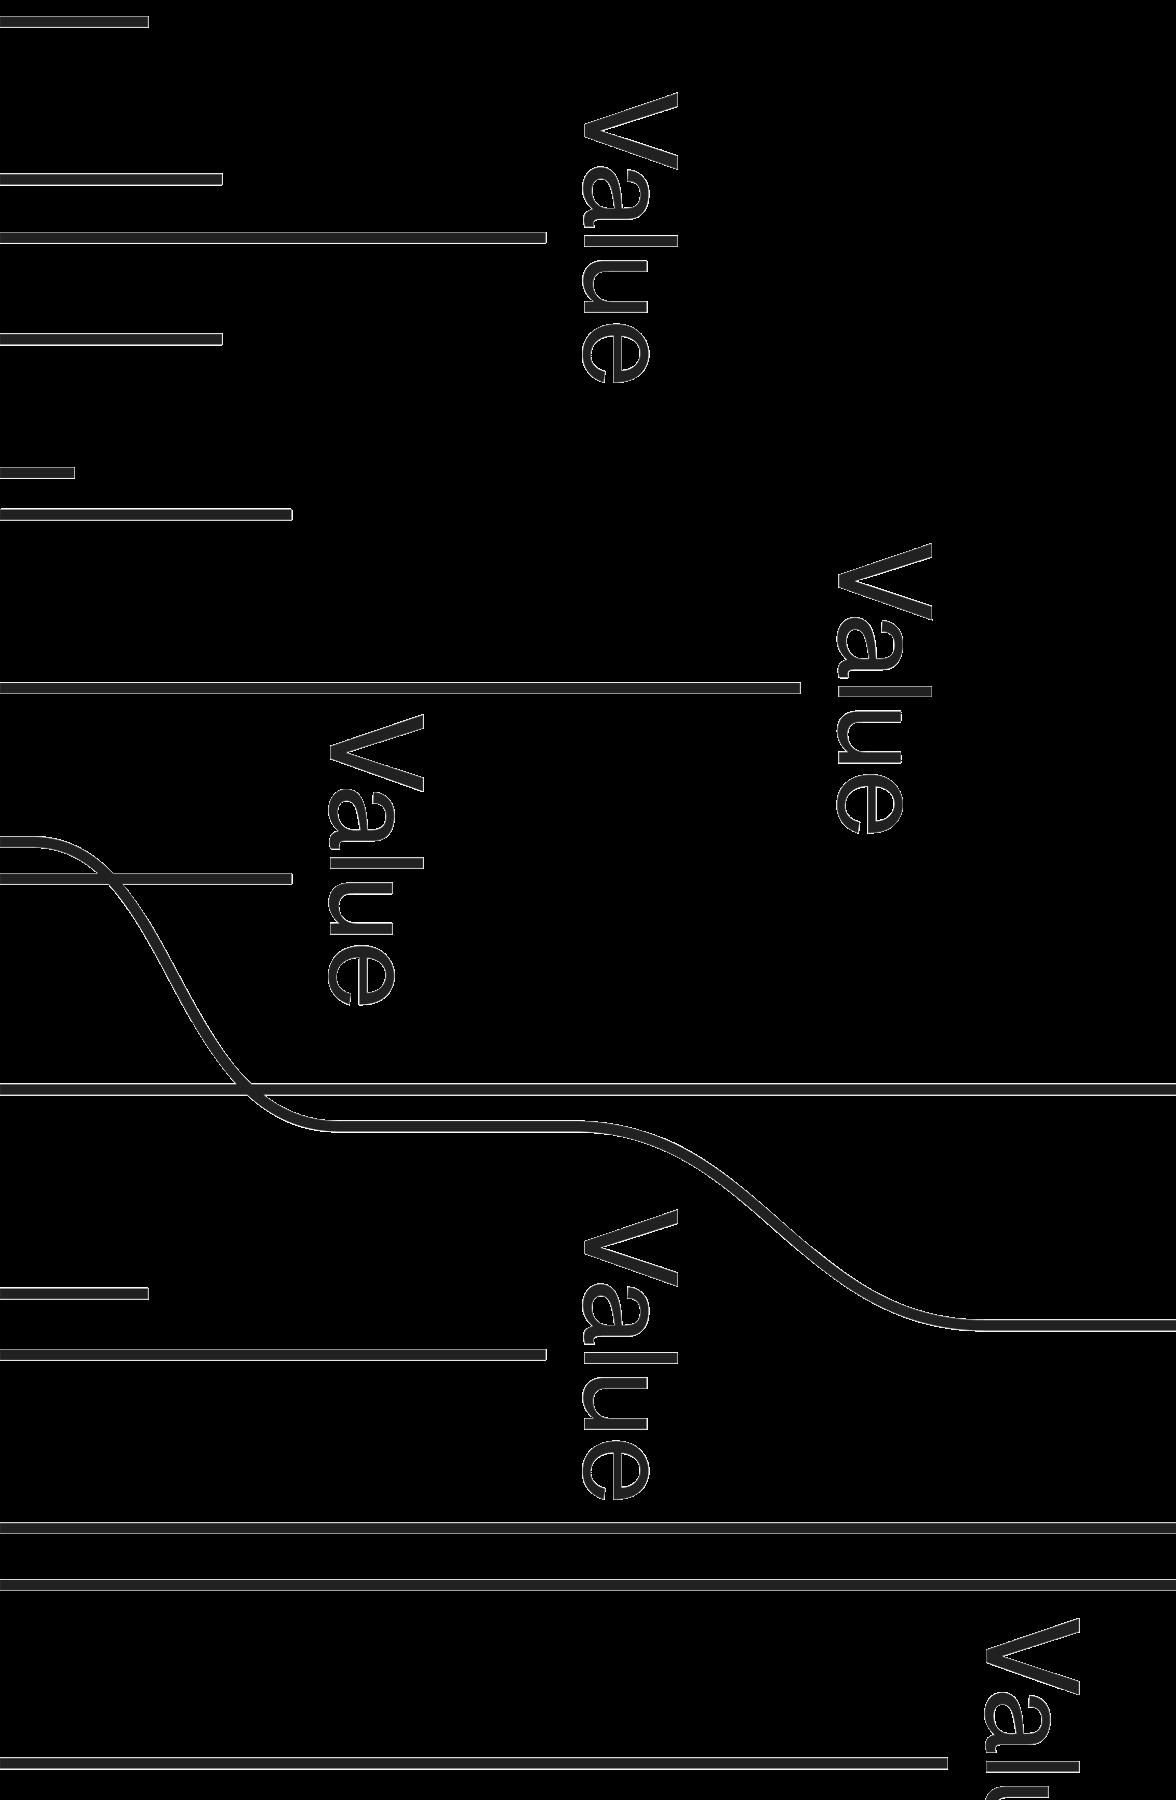 KjellanderSjoberg Workbook Value